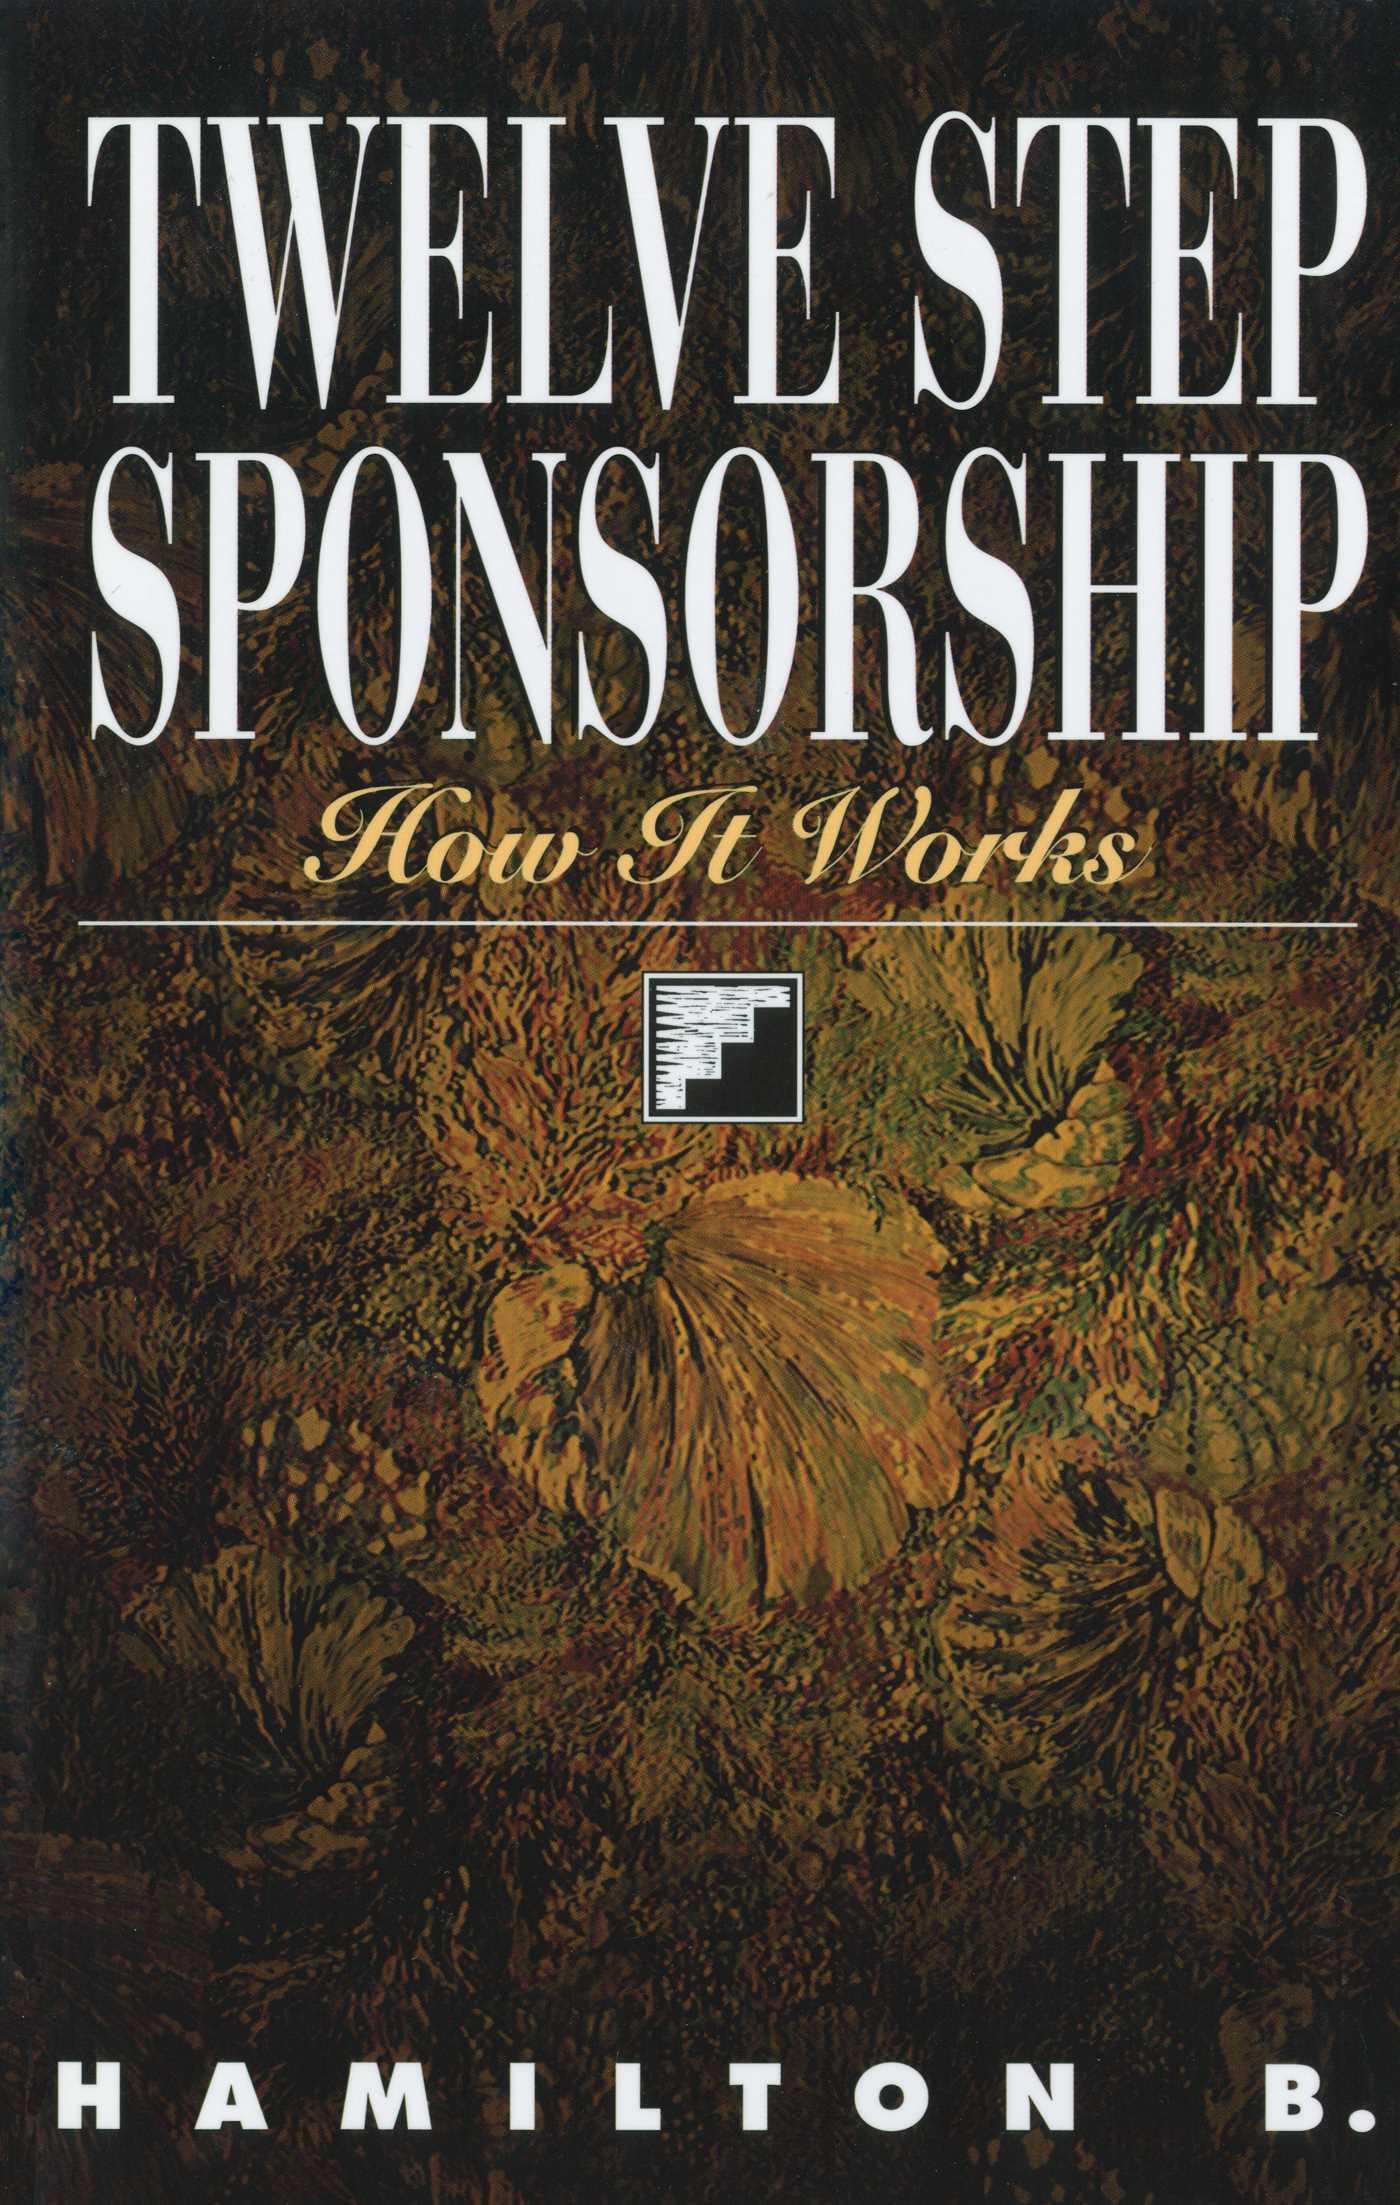 Twelve step sponsorship 9781568381220 hr